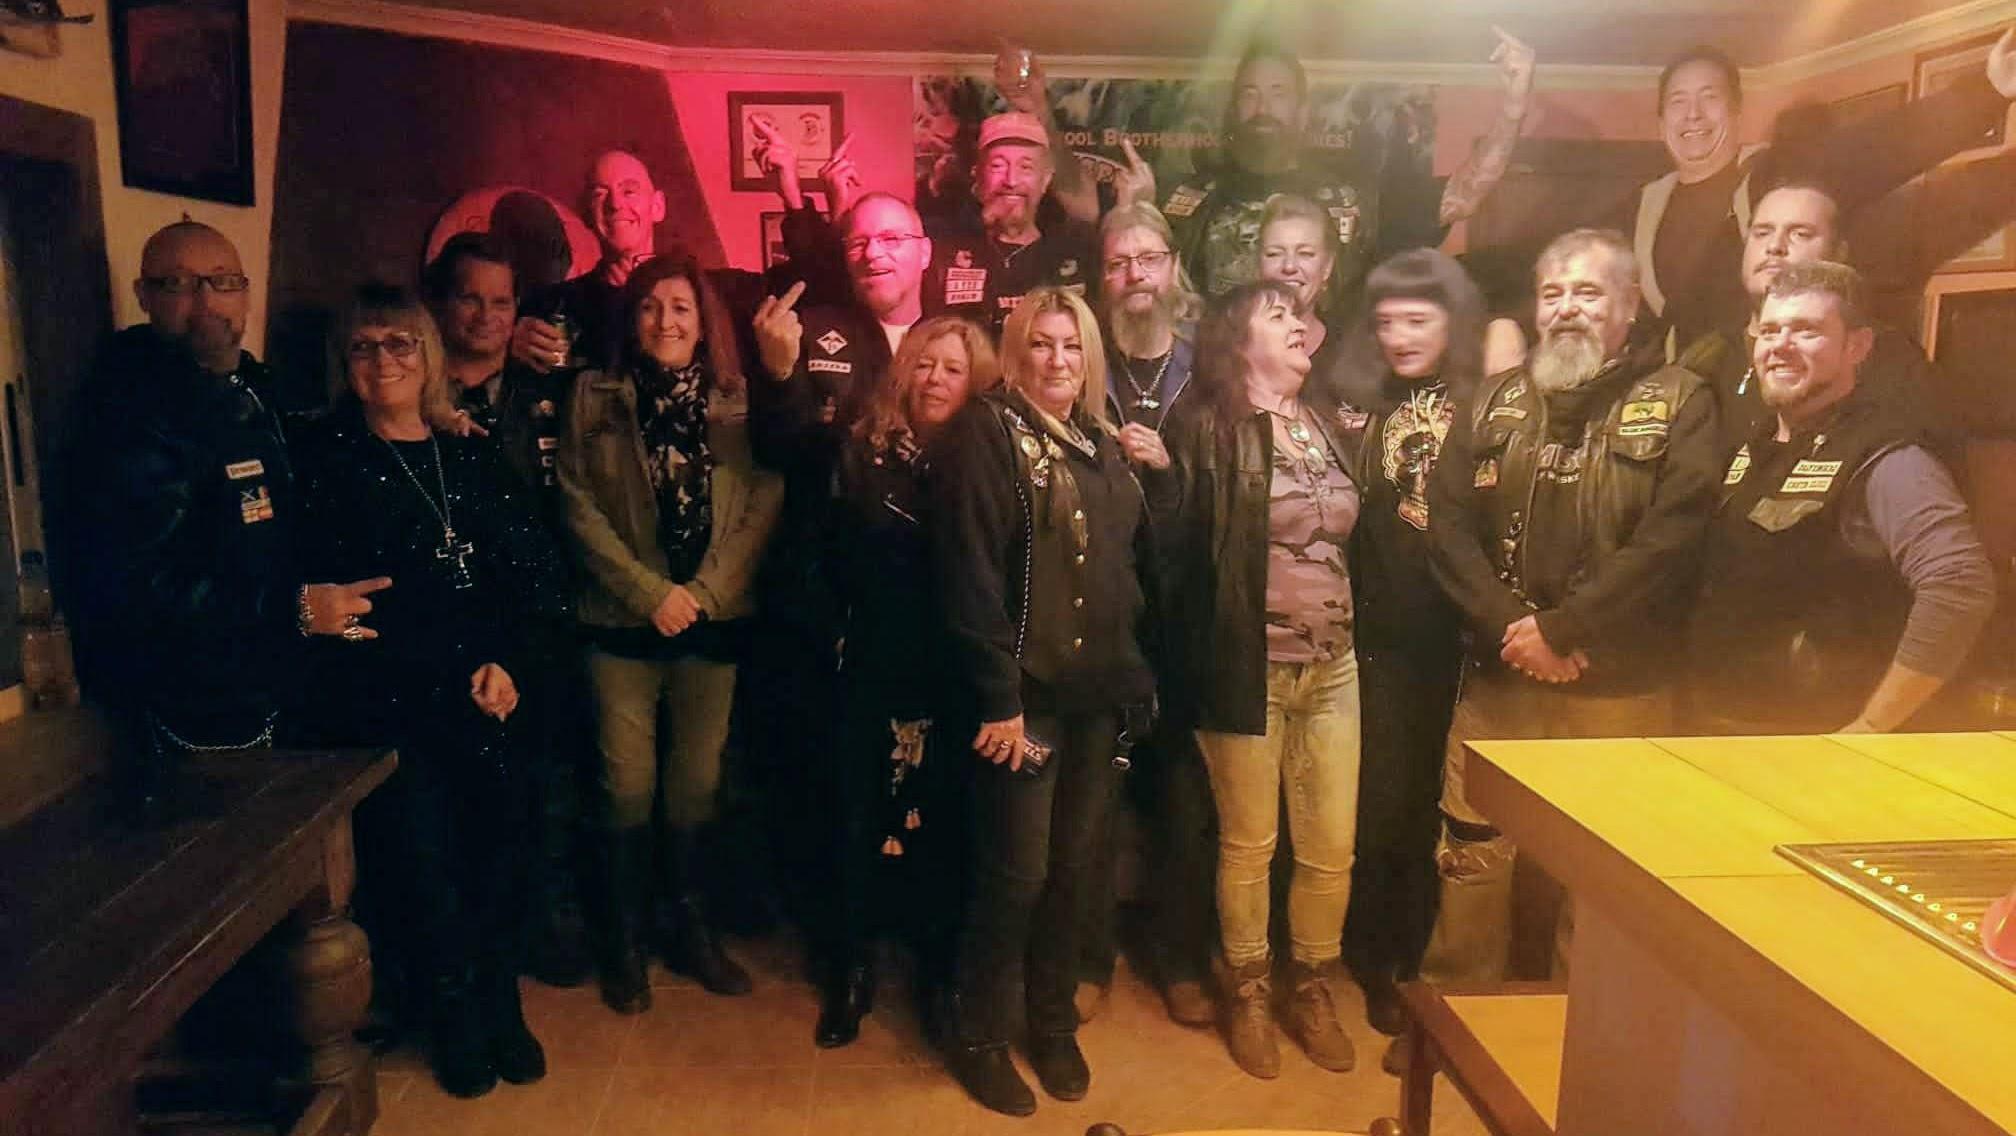 Blue Skulls mc visit Scavengers mc